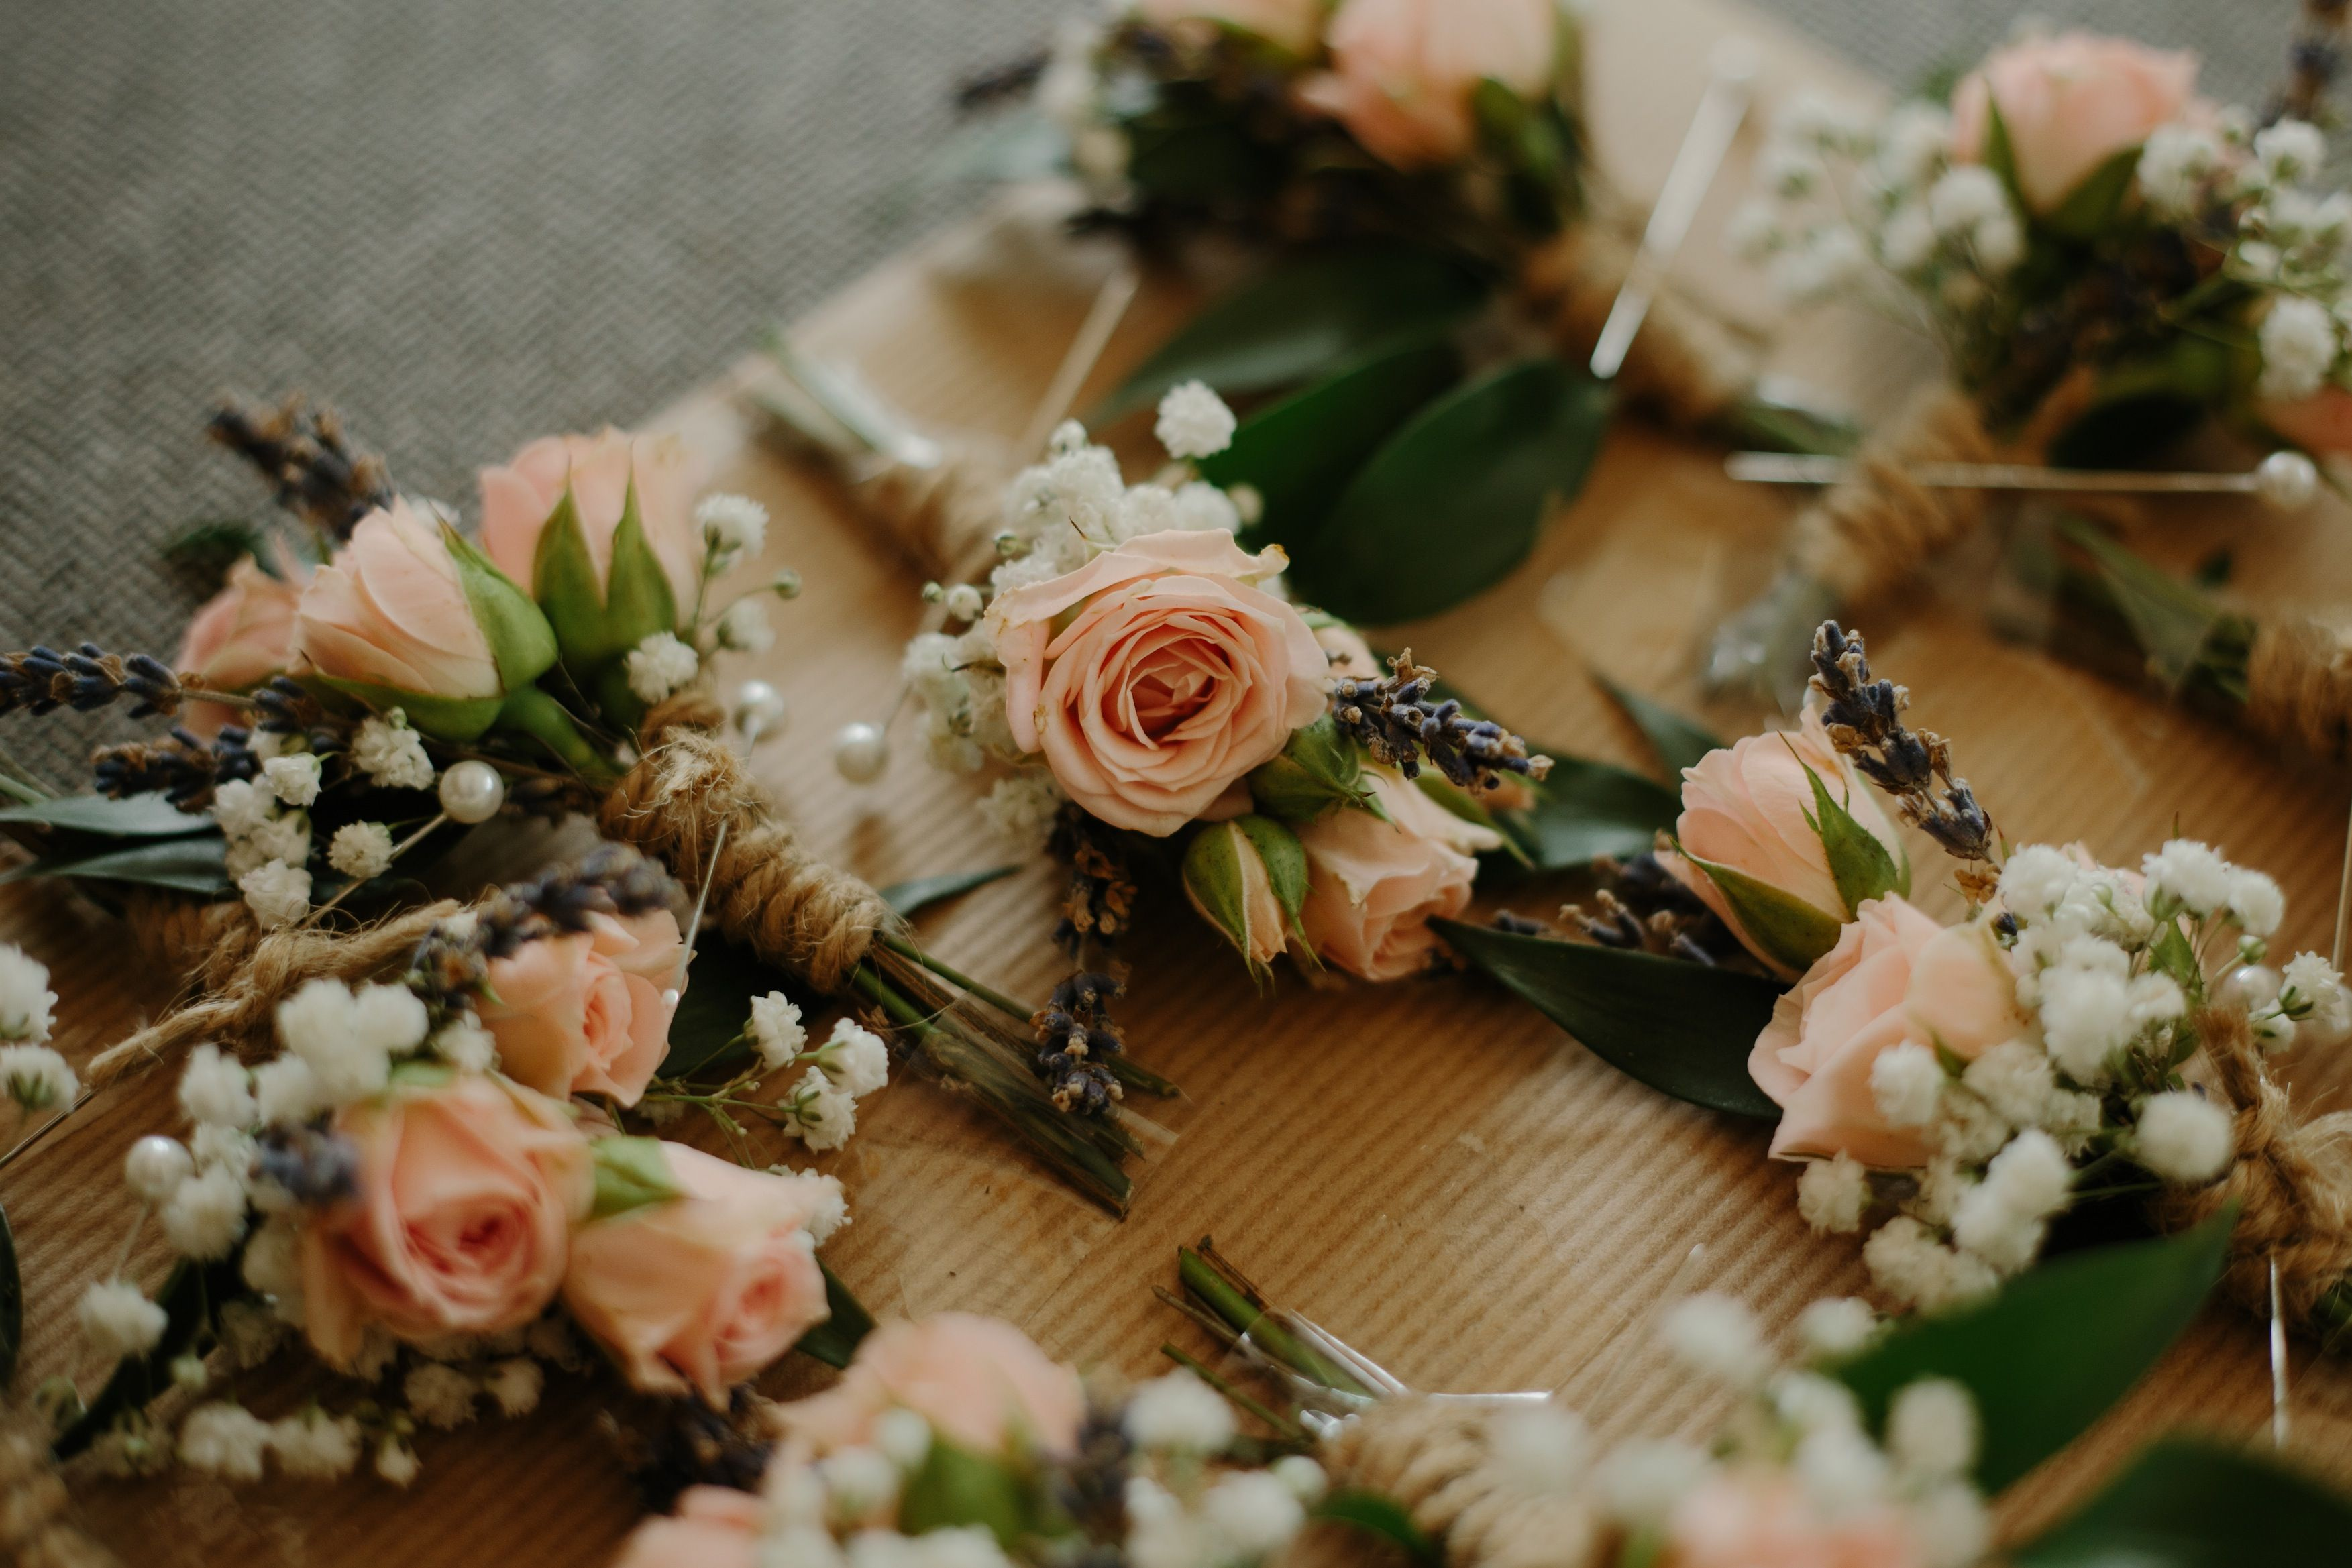 Rose buttonholes for the groom groomsmen wedding goals